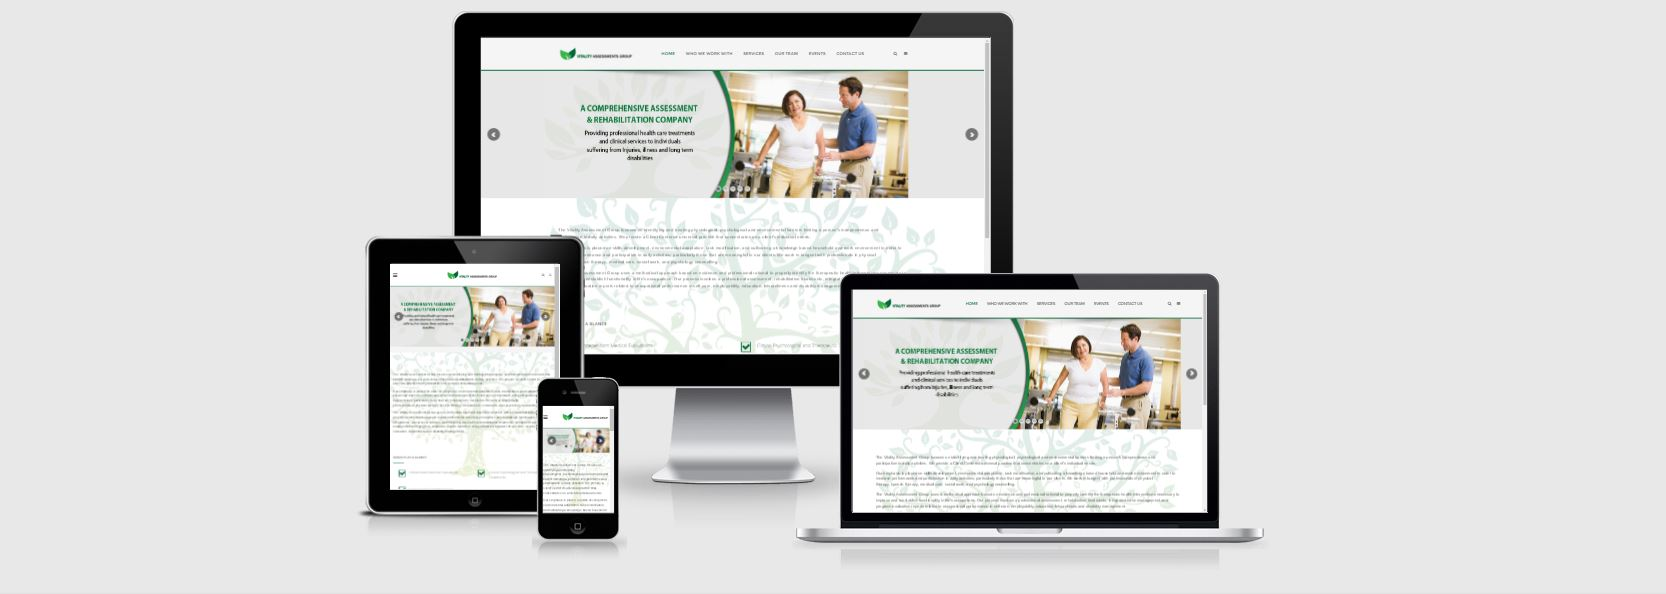 website-design-vitalityassessmentsgroup-com